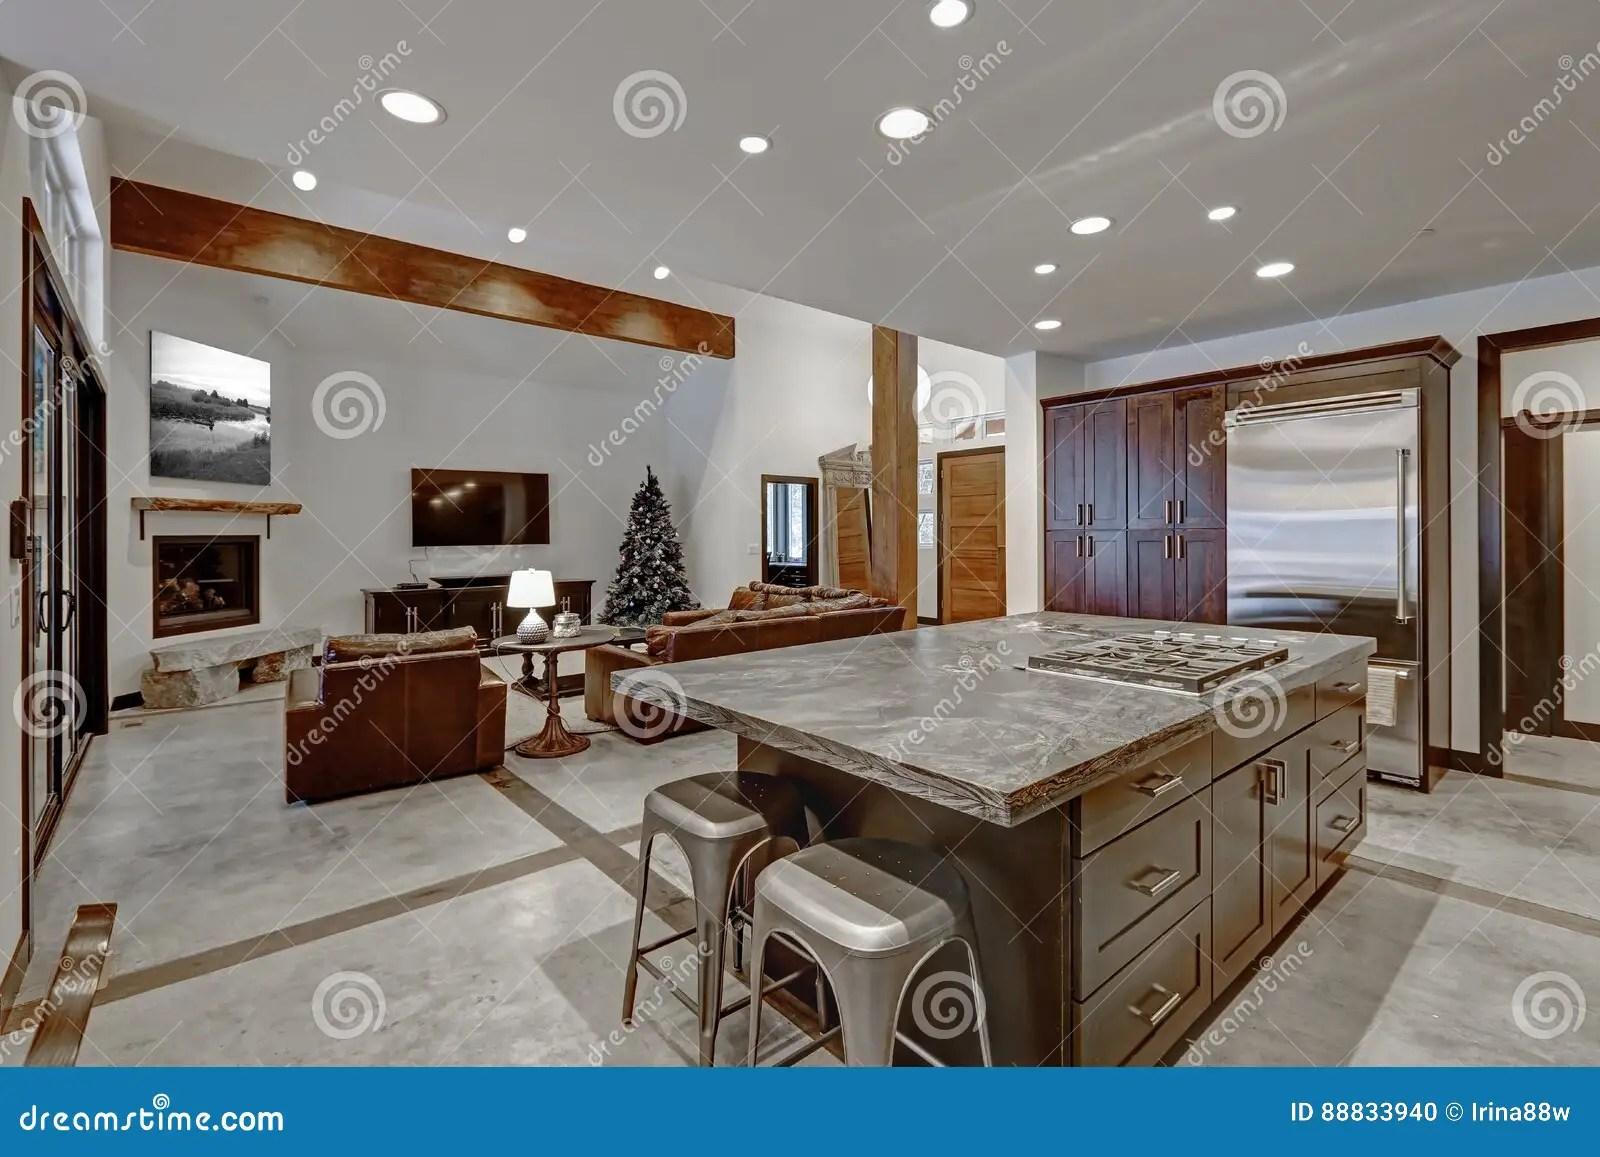 kitchen floor designs eat in sets 在灰色口气的现代开放地板厨房设计库存照片 图片包括有拱道 空间 典雅 在灰色口气的现代开放地板厨房设计